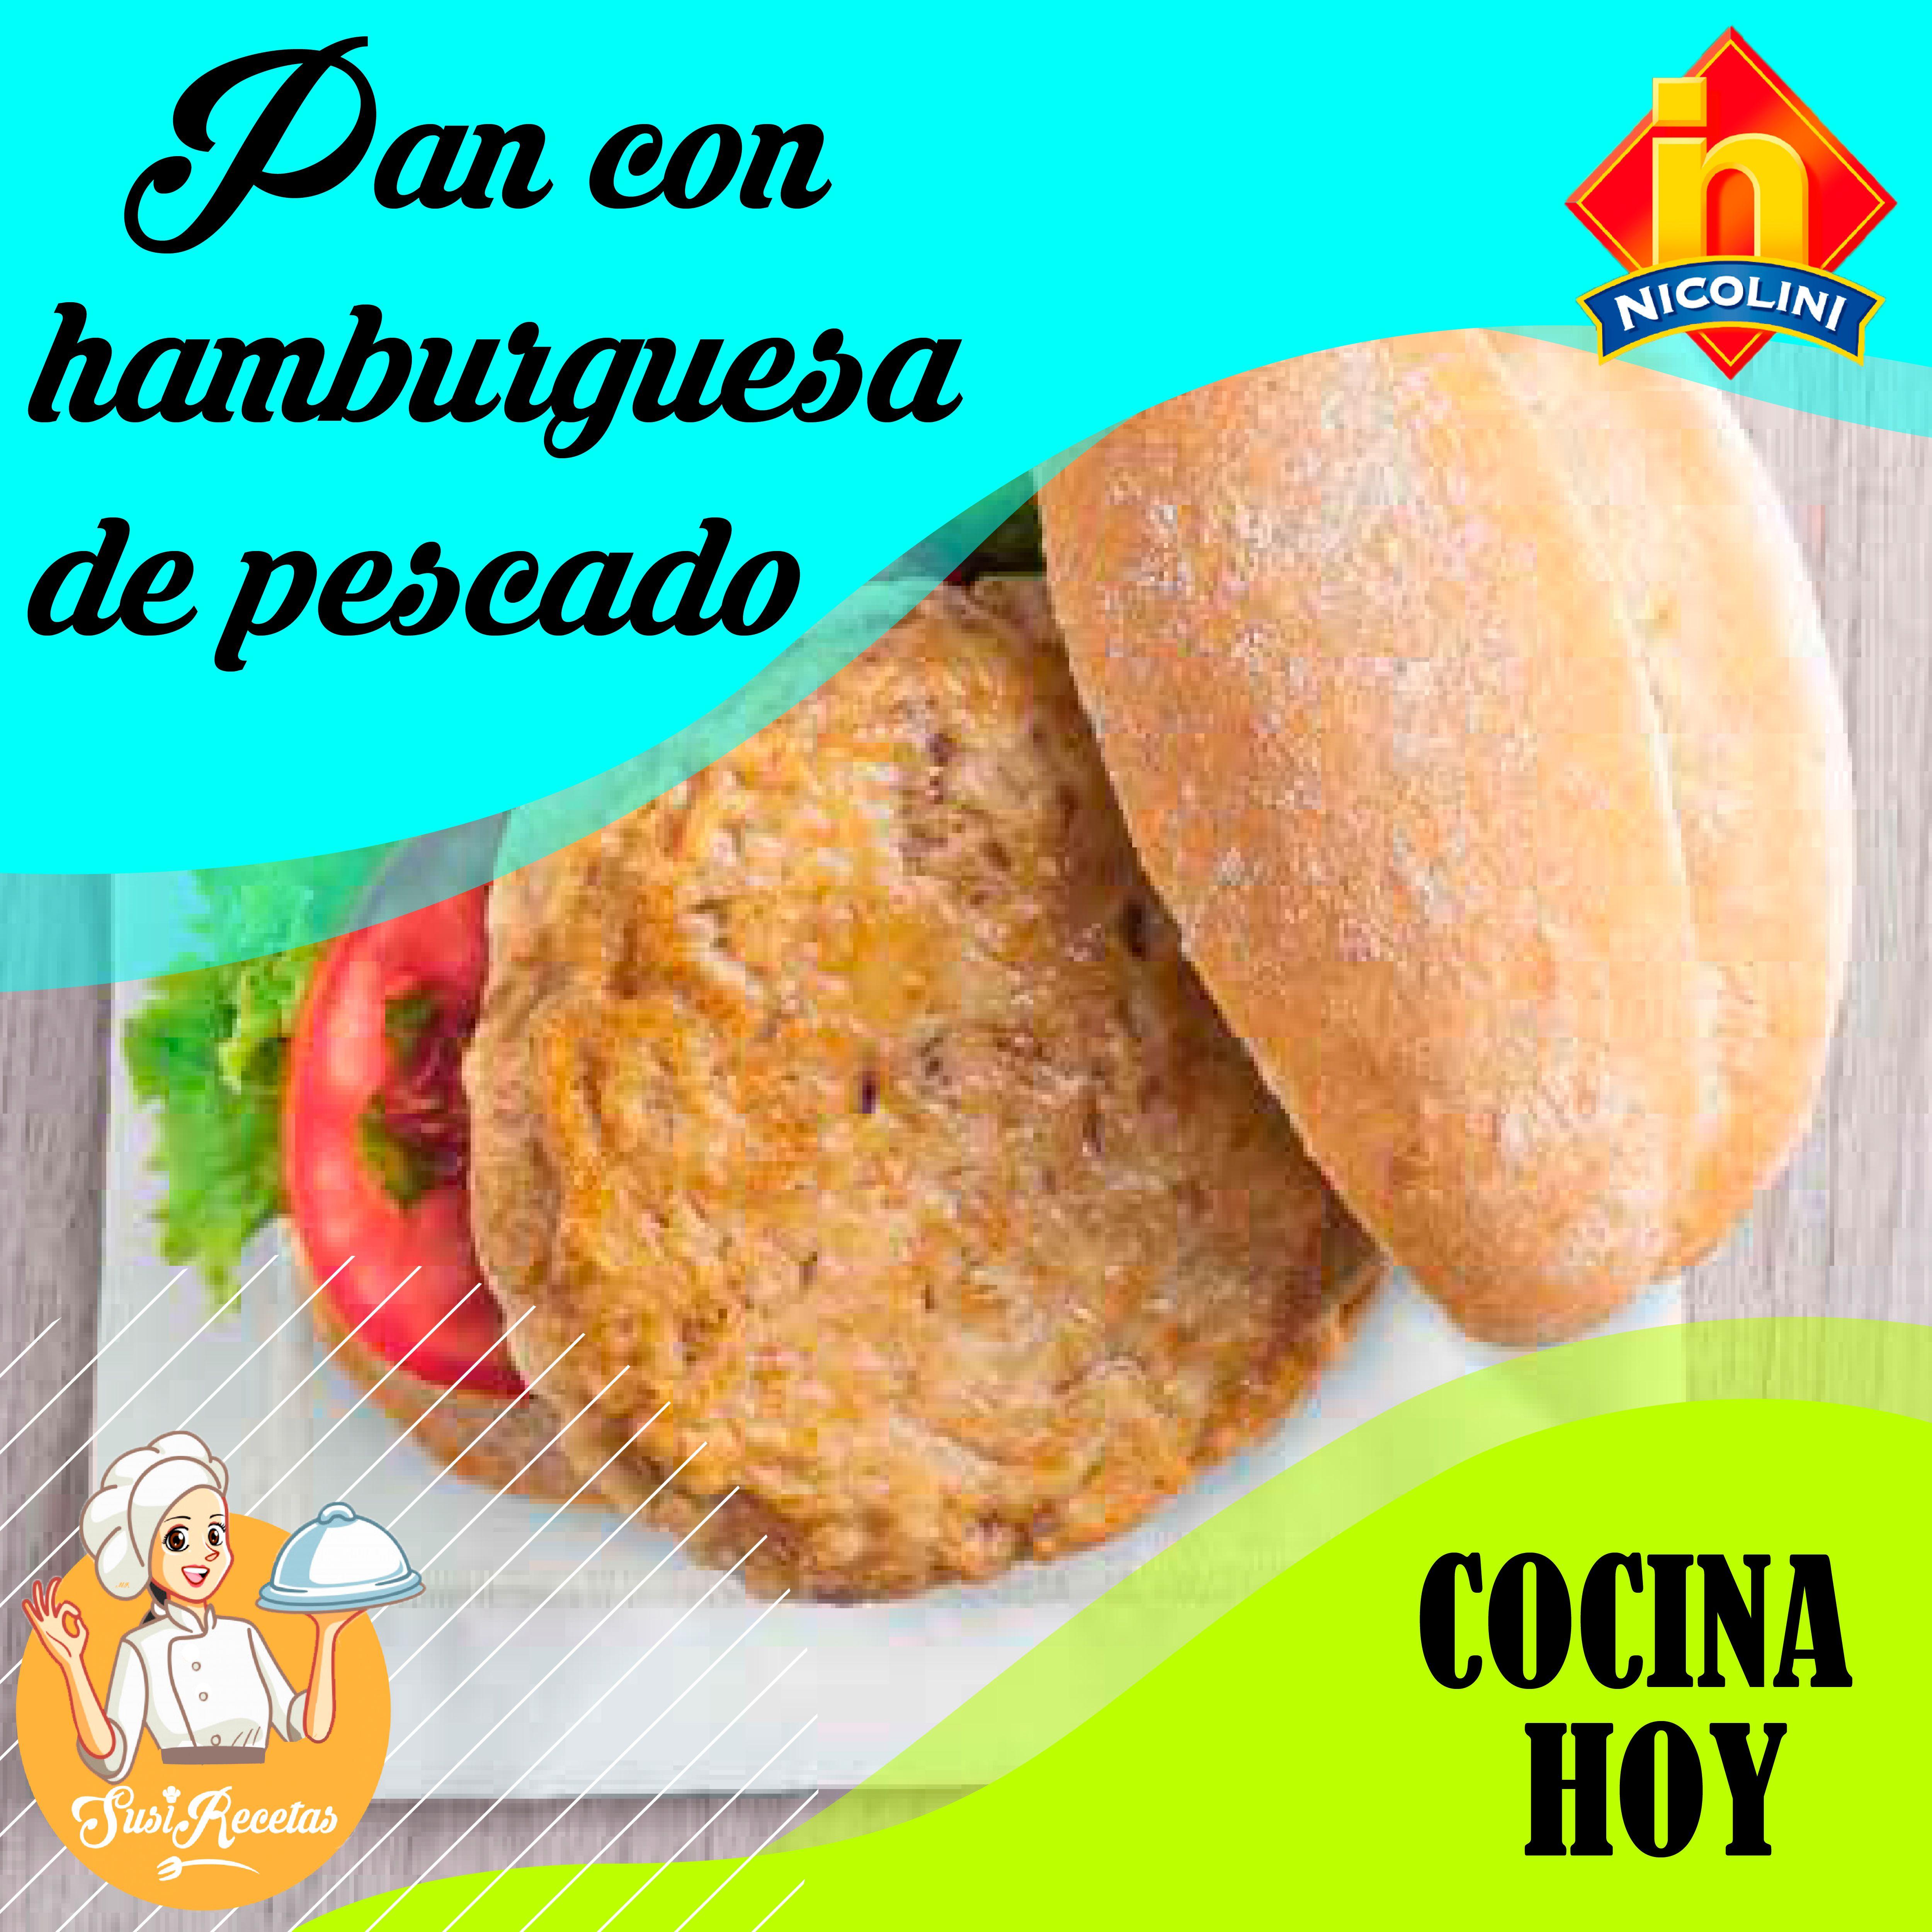 #breakfast #foodie #food #saludable #cafe #postres #venezuela #happy #maracaibo #almuerzos #tortas #chocolate #dulces #desayunos #foodporn #nutricion #fitfood #dessert #fitfam #love #cake #coffee #ensaladas #sweet #comidasana #dieta #instafood #desserts #avena #cupcakes